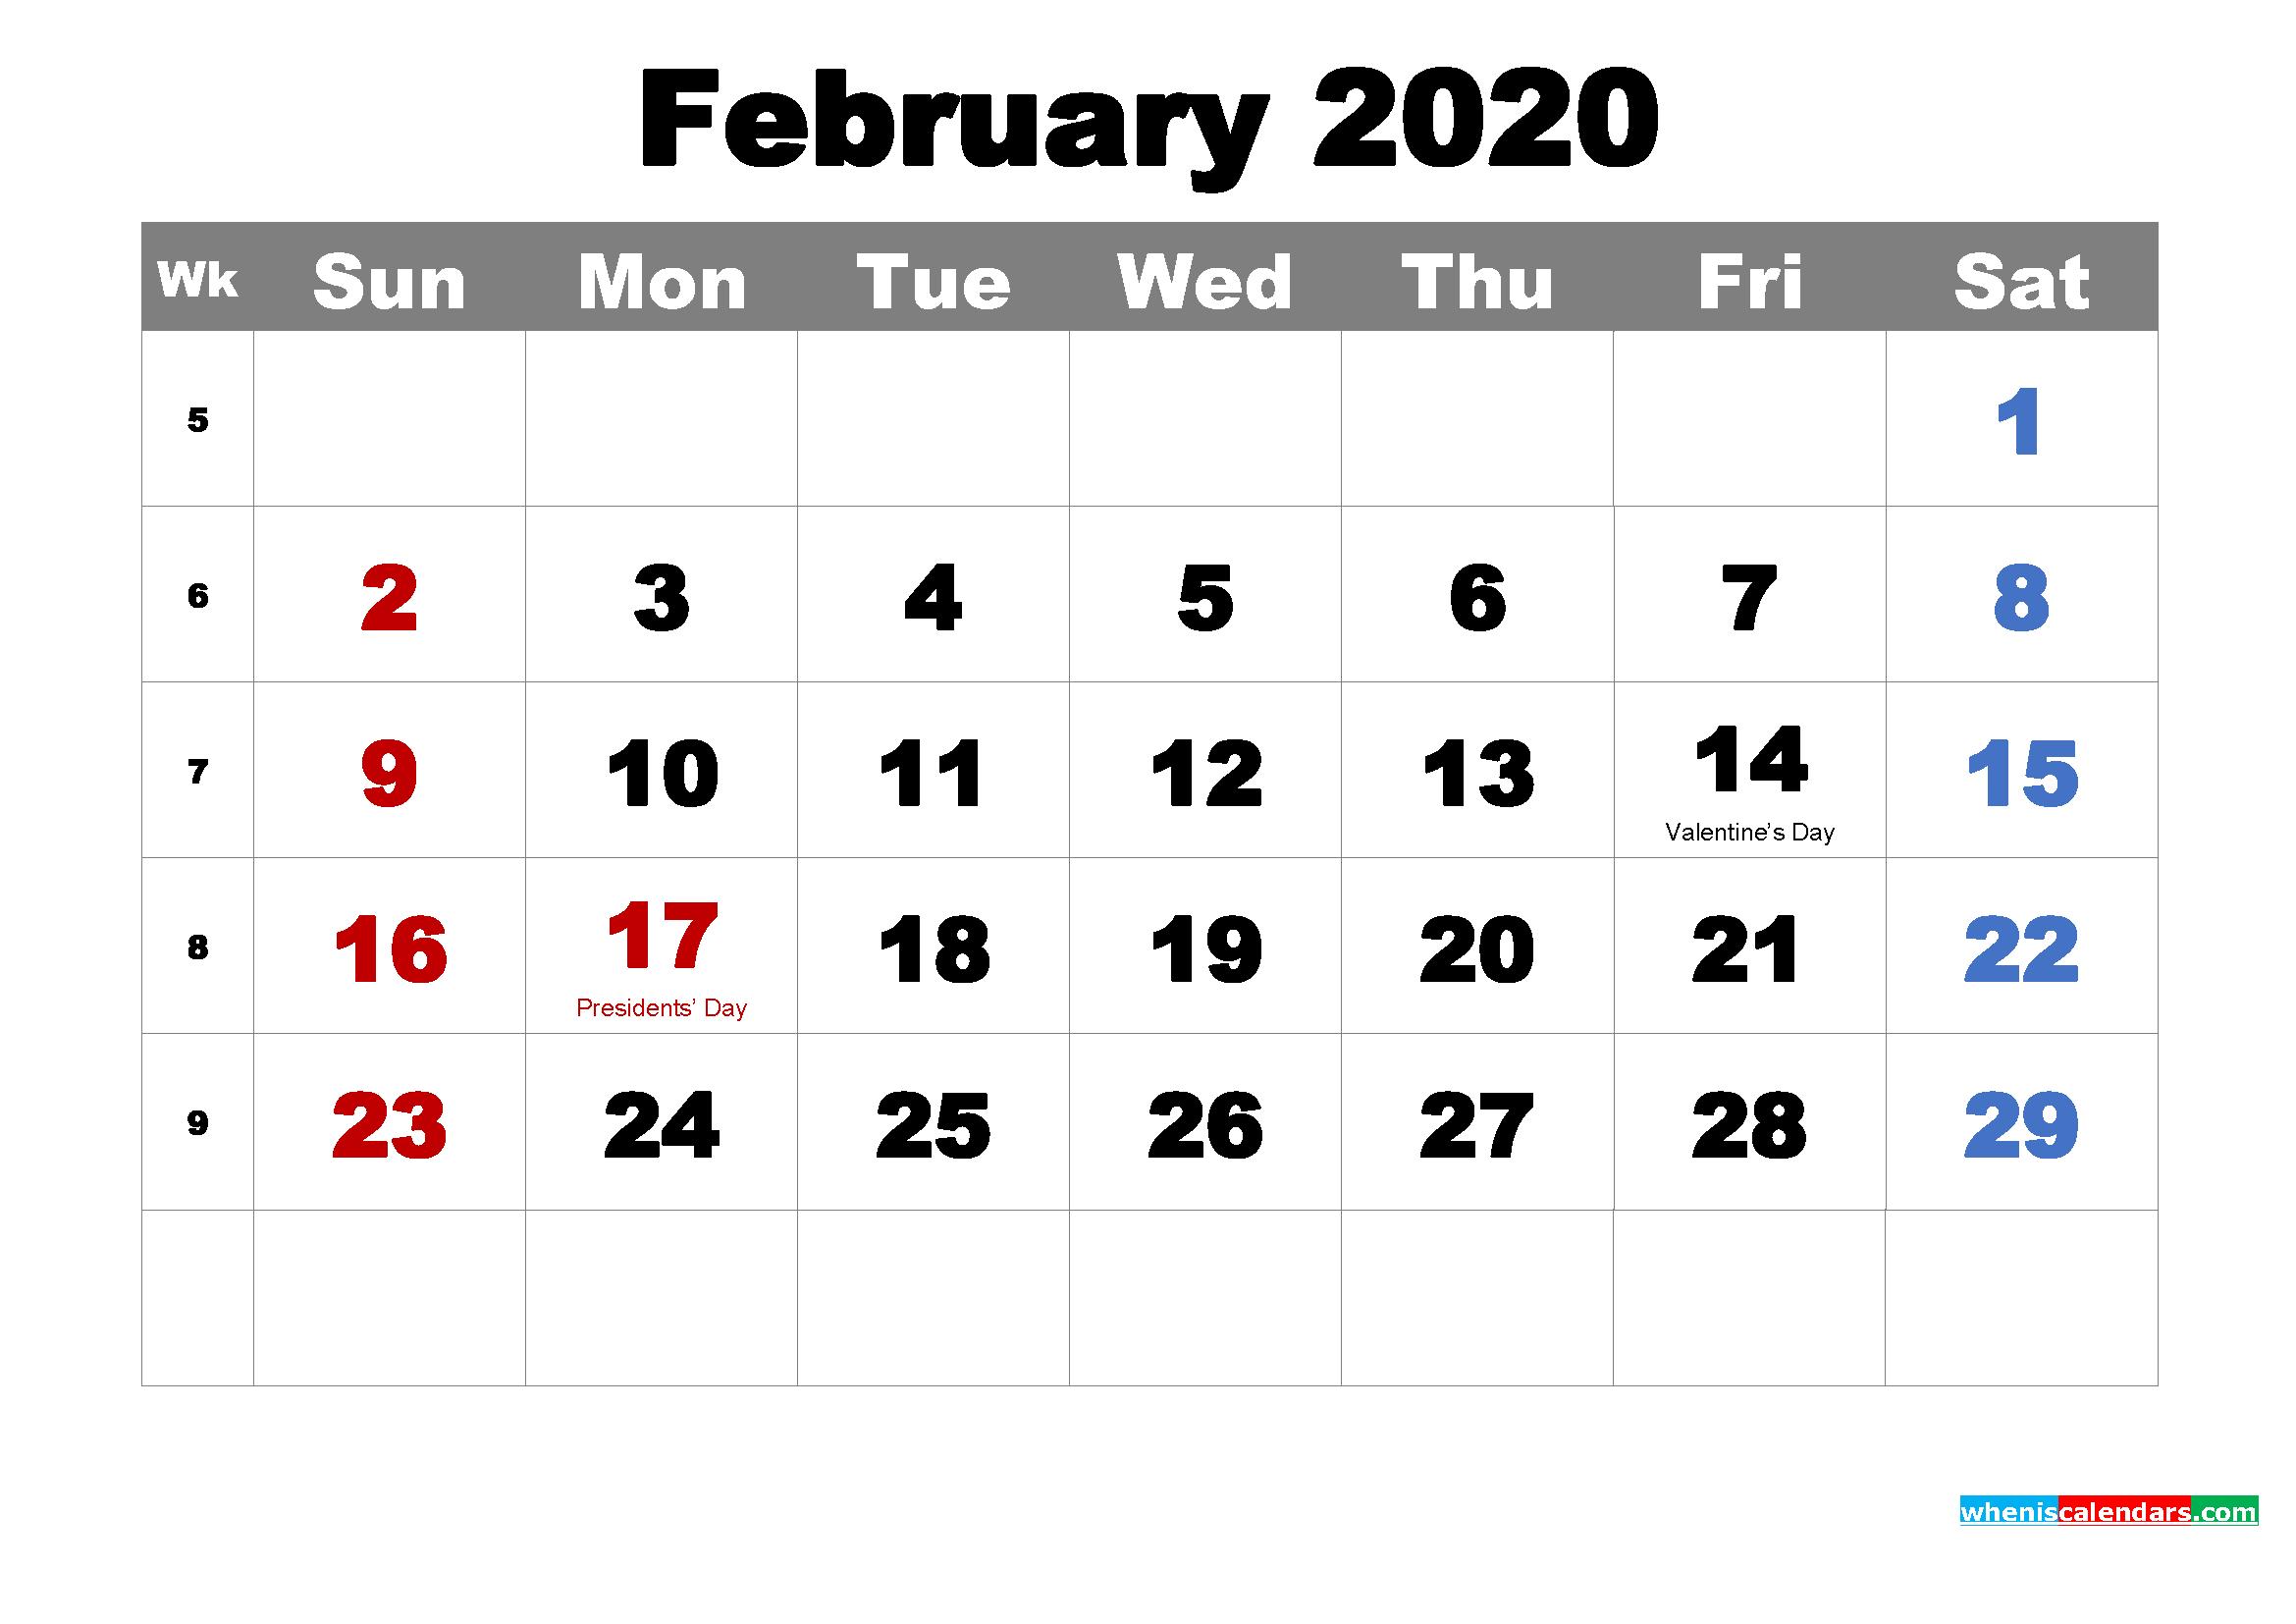 Printable February 2020 Calendar by Month